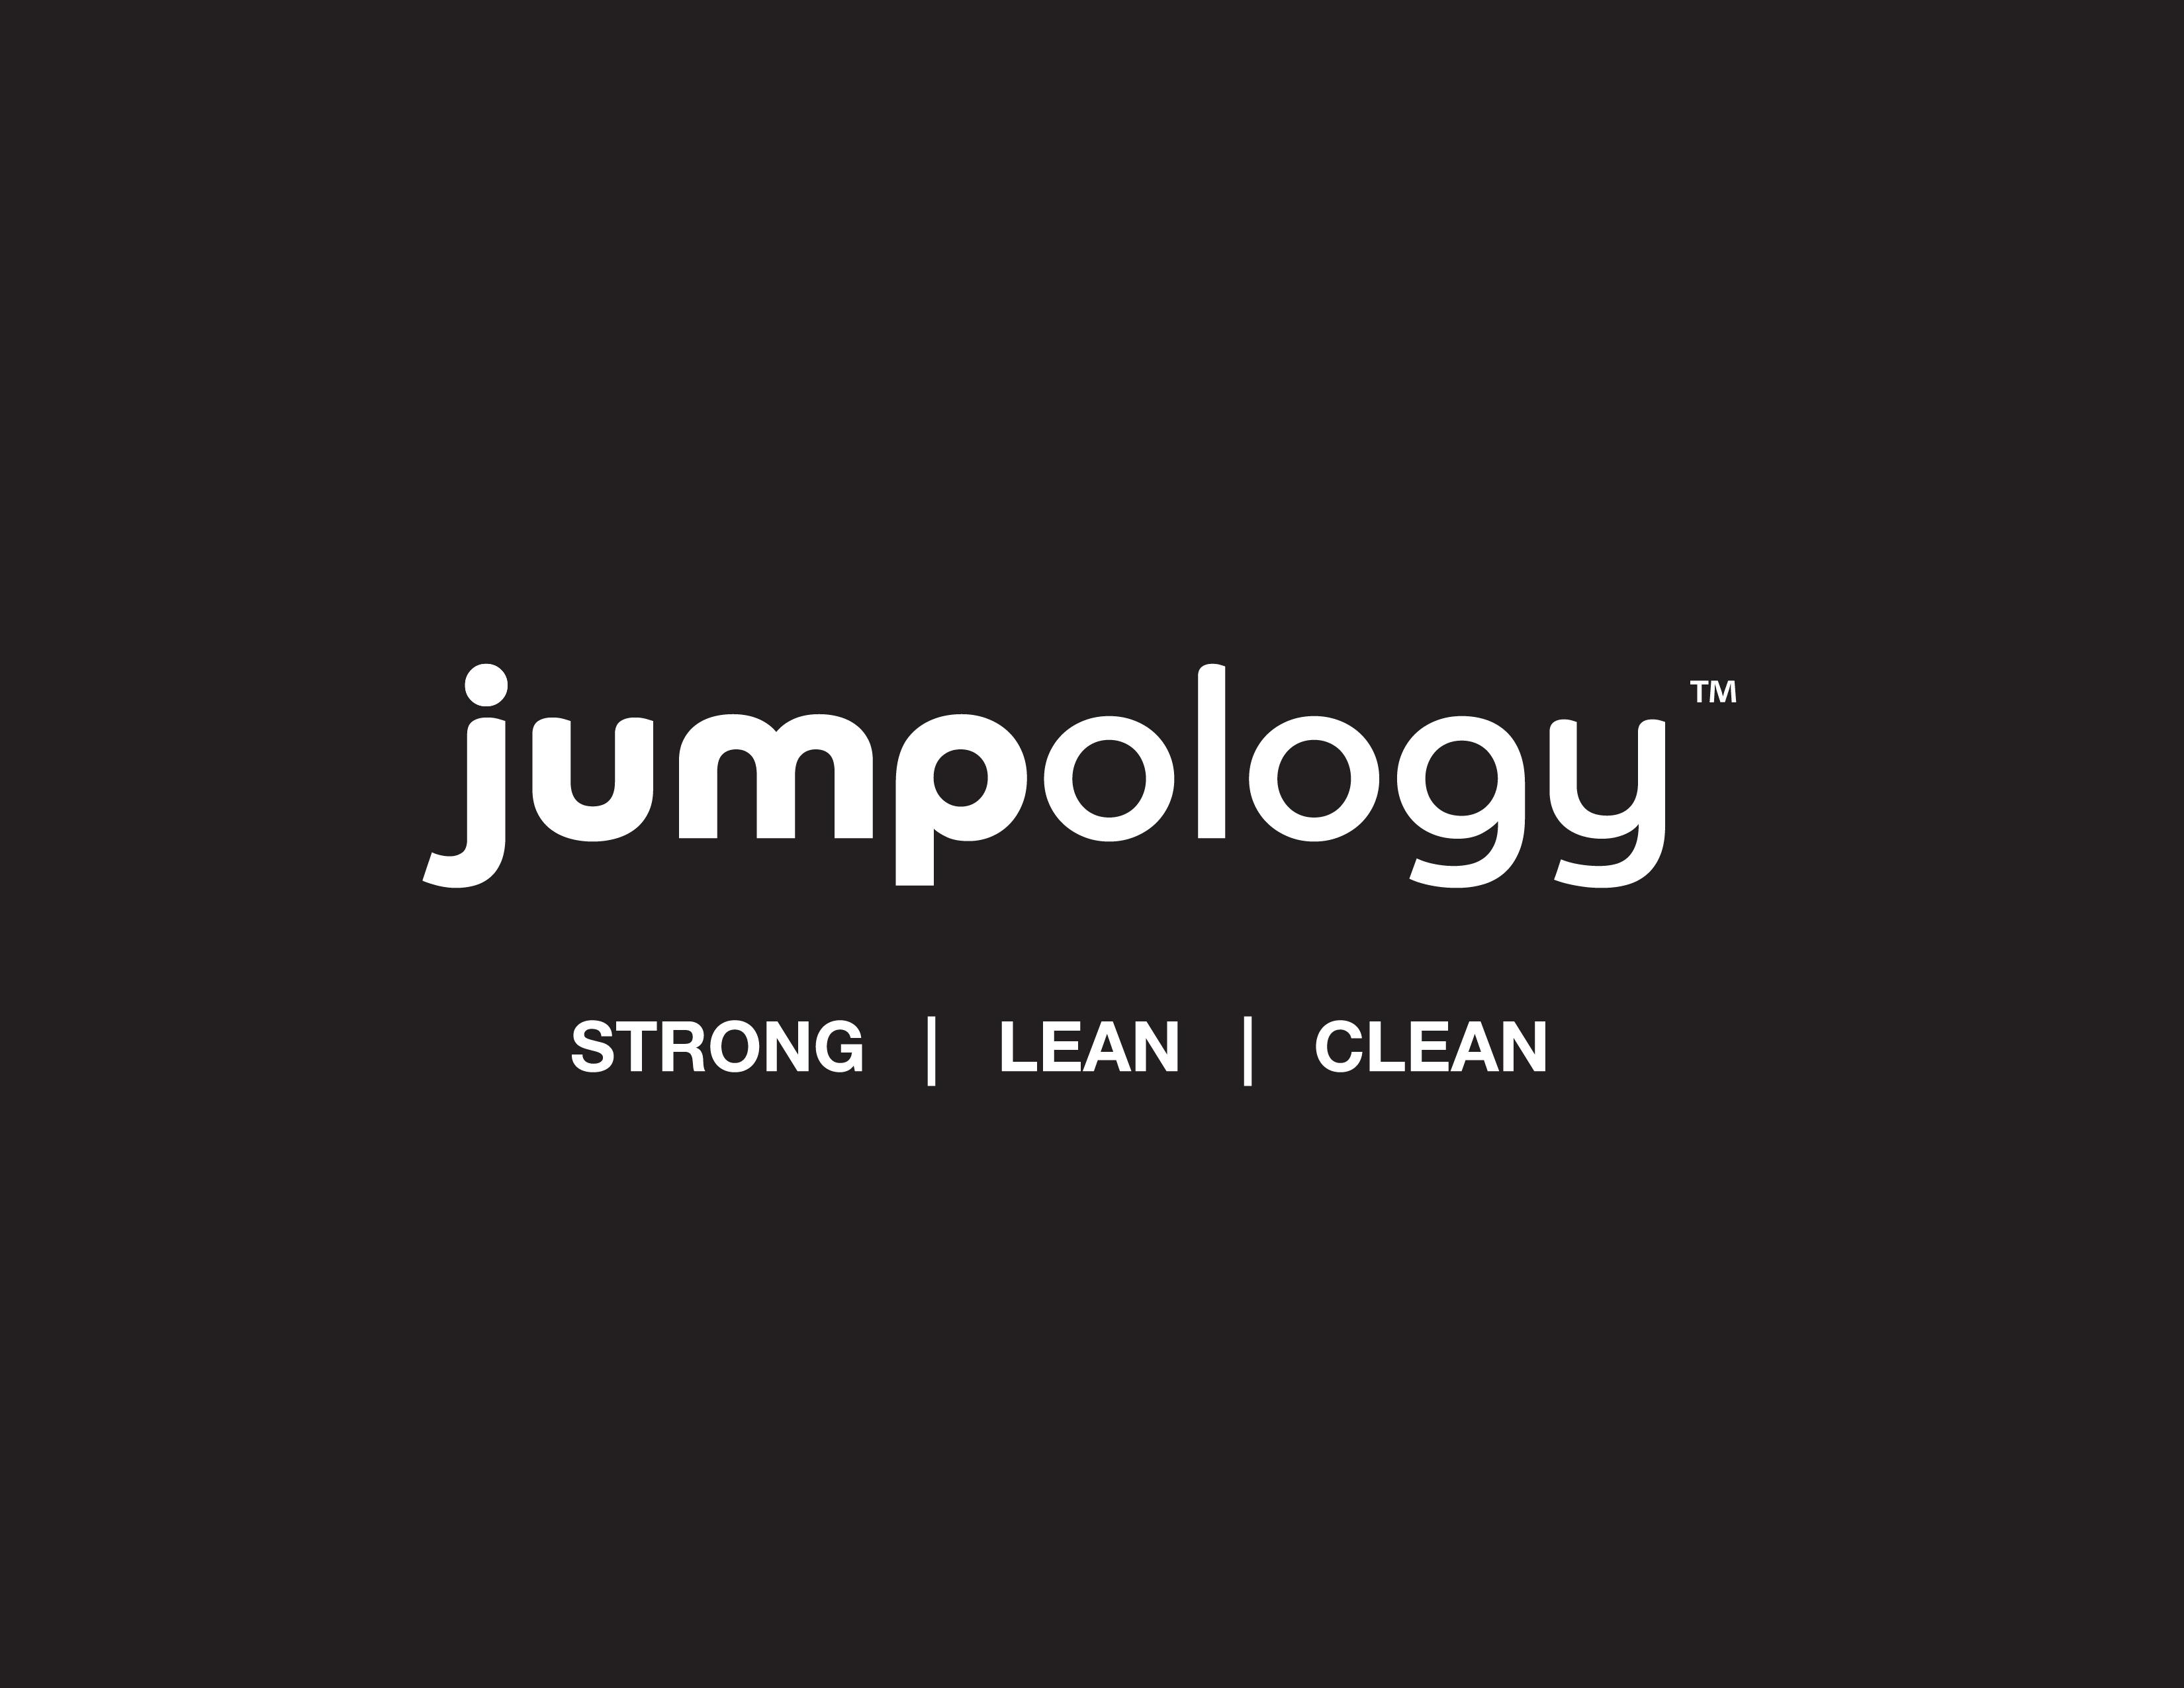 Jumpology_logo_bw_out